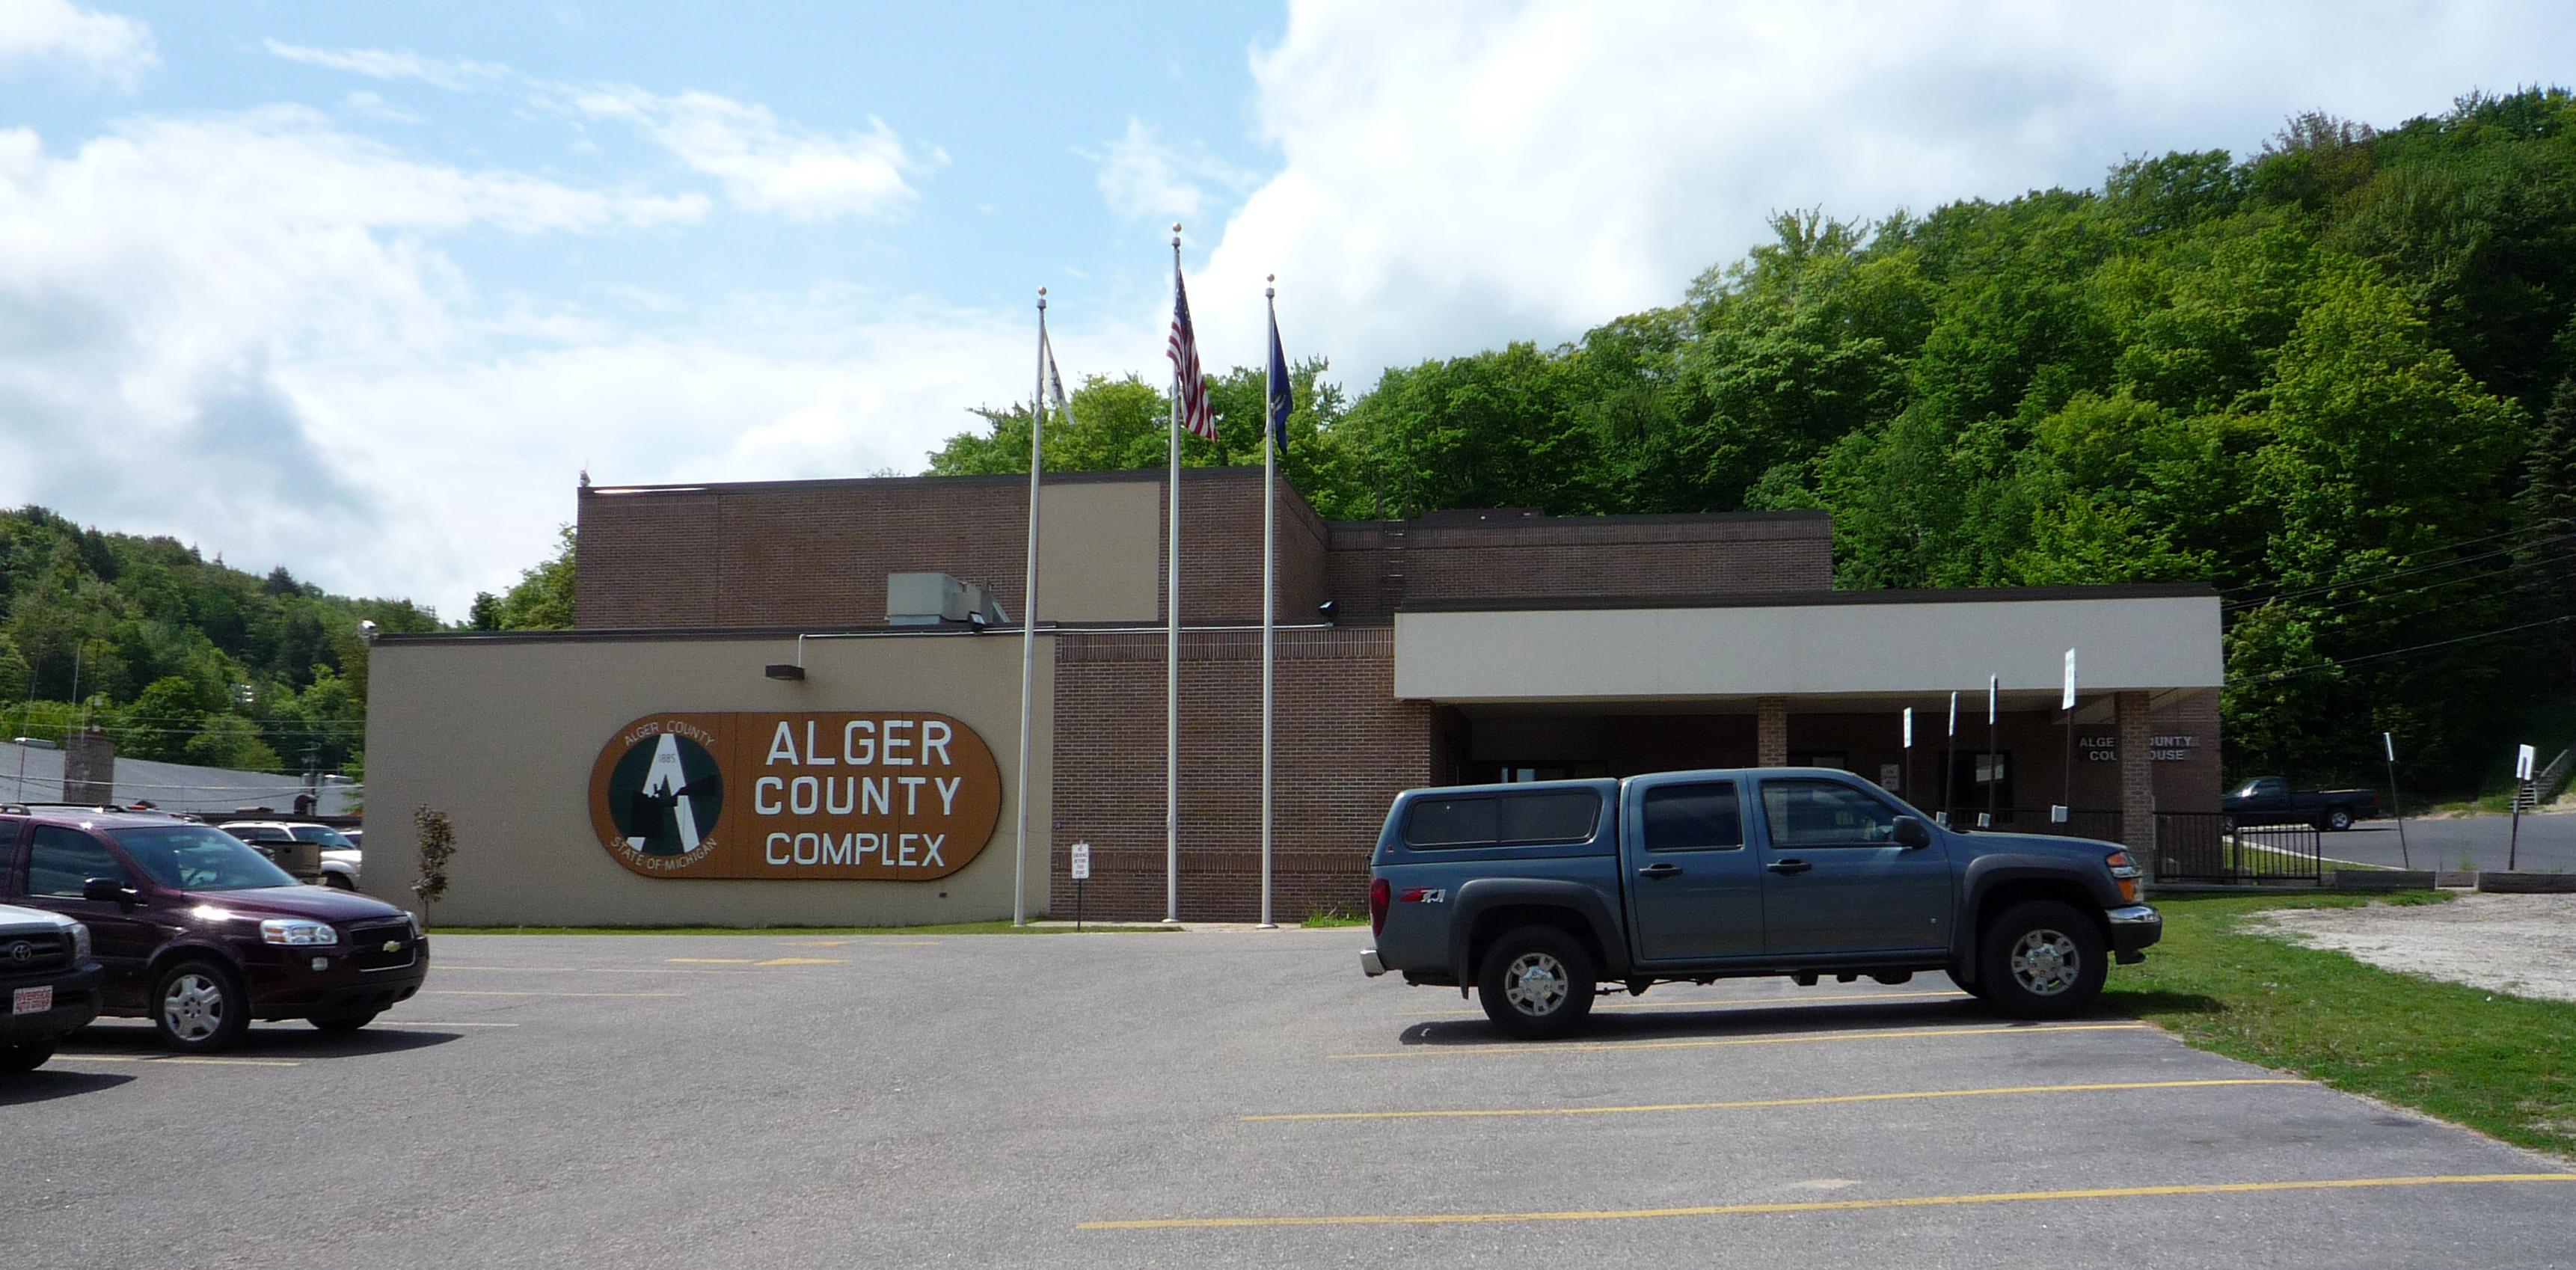 Michigan alger county munising - Michigan Alger County Munising 10